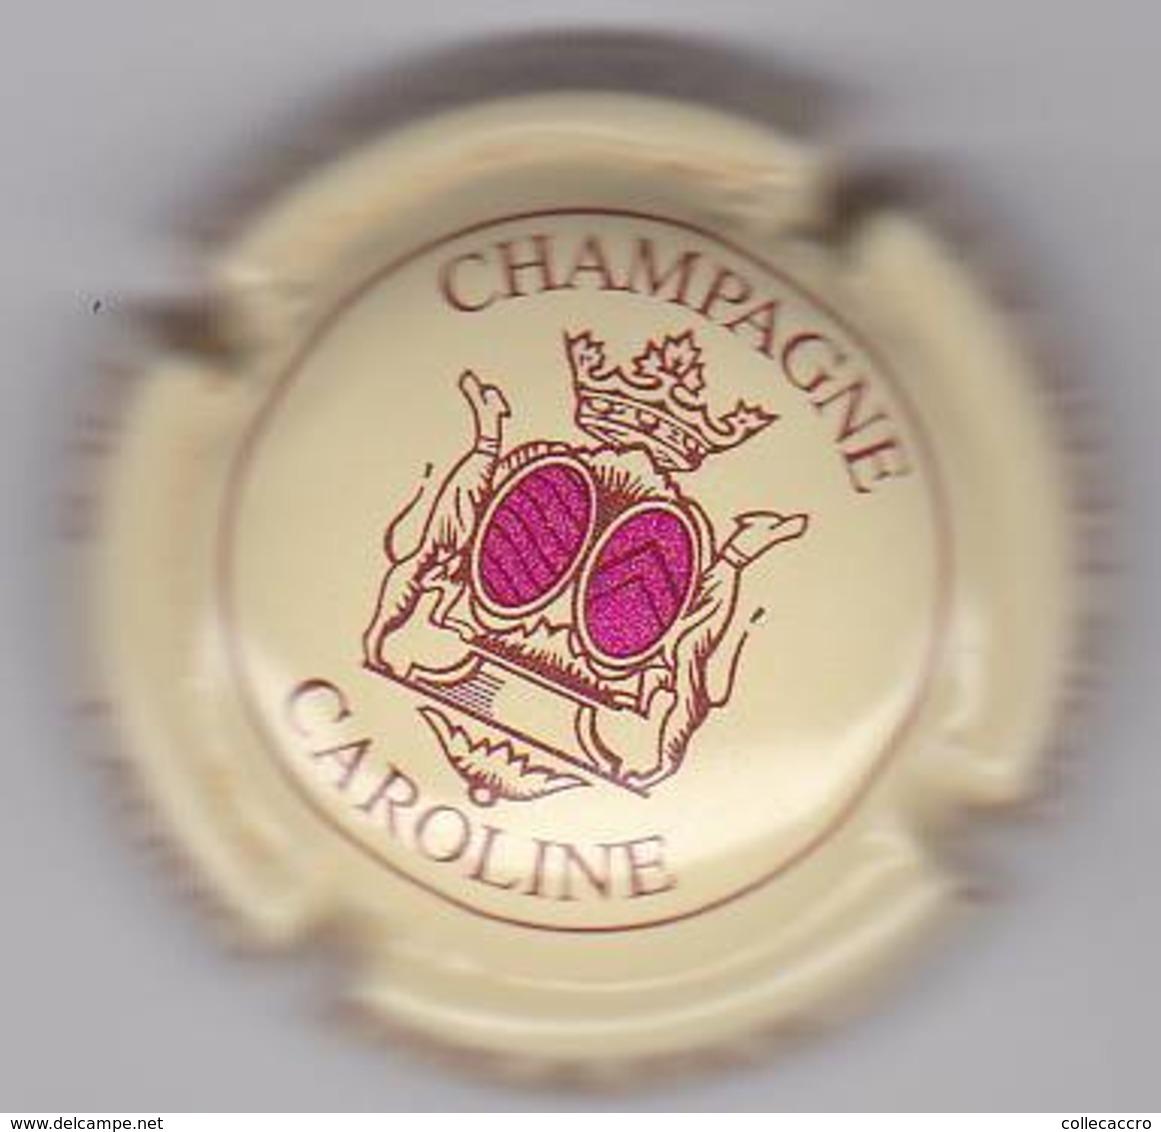 LAUNOIS N°9 - Champagne